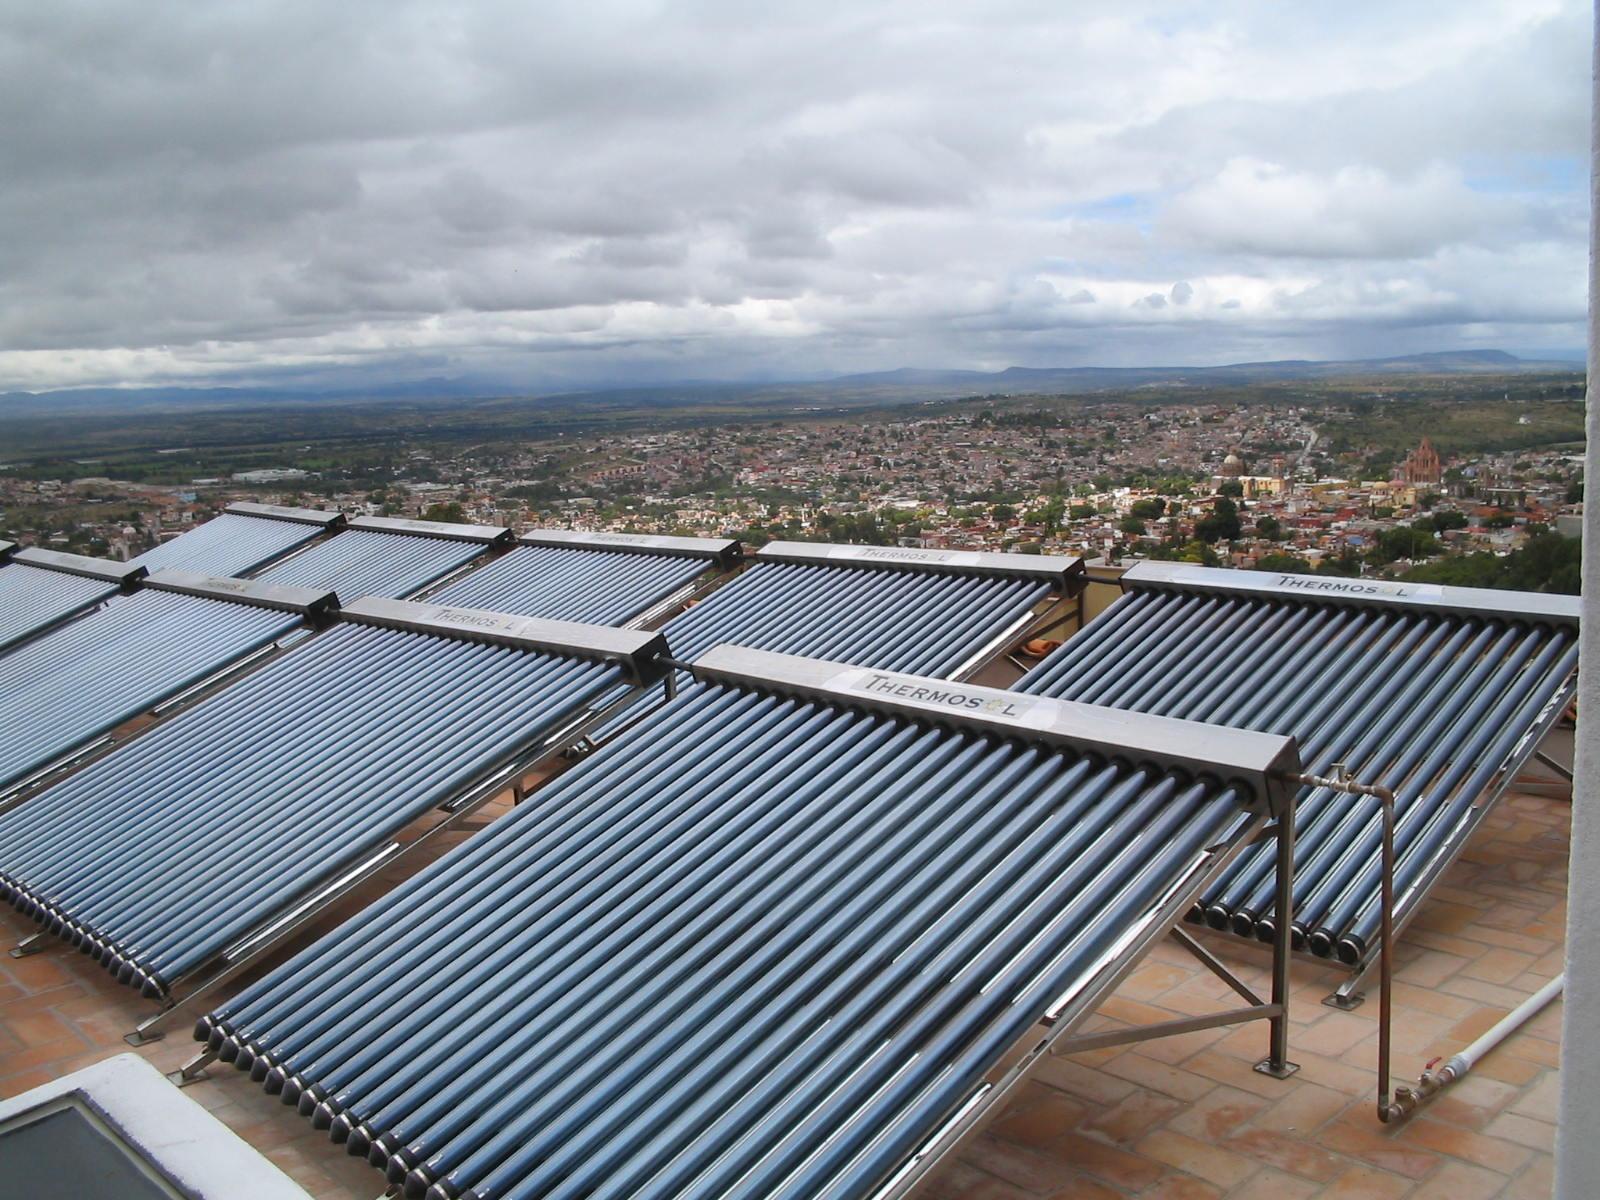 https://0201.nccdn.net/1_2/000/000/0ad/800/Sistema-de-Calentadores-Solares-en-Celaya-Guanajuato-2-1600x1200.jpg